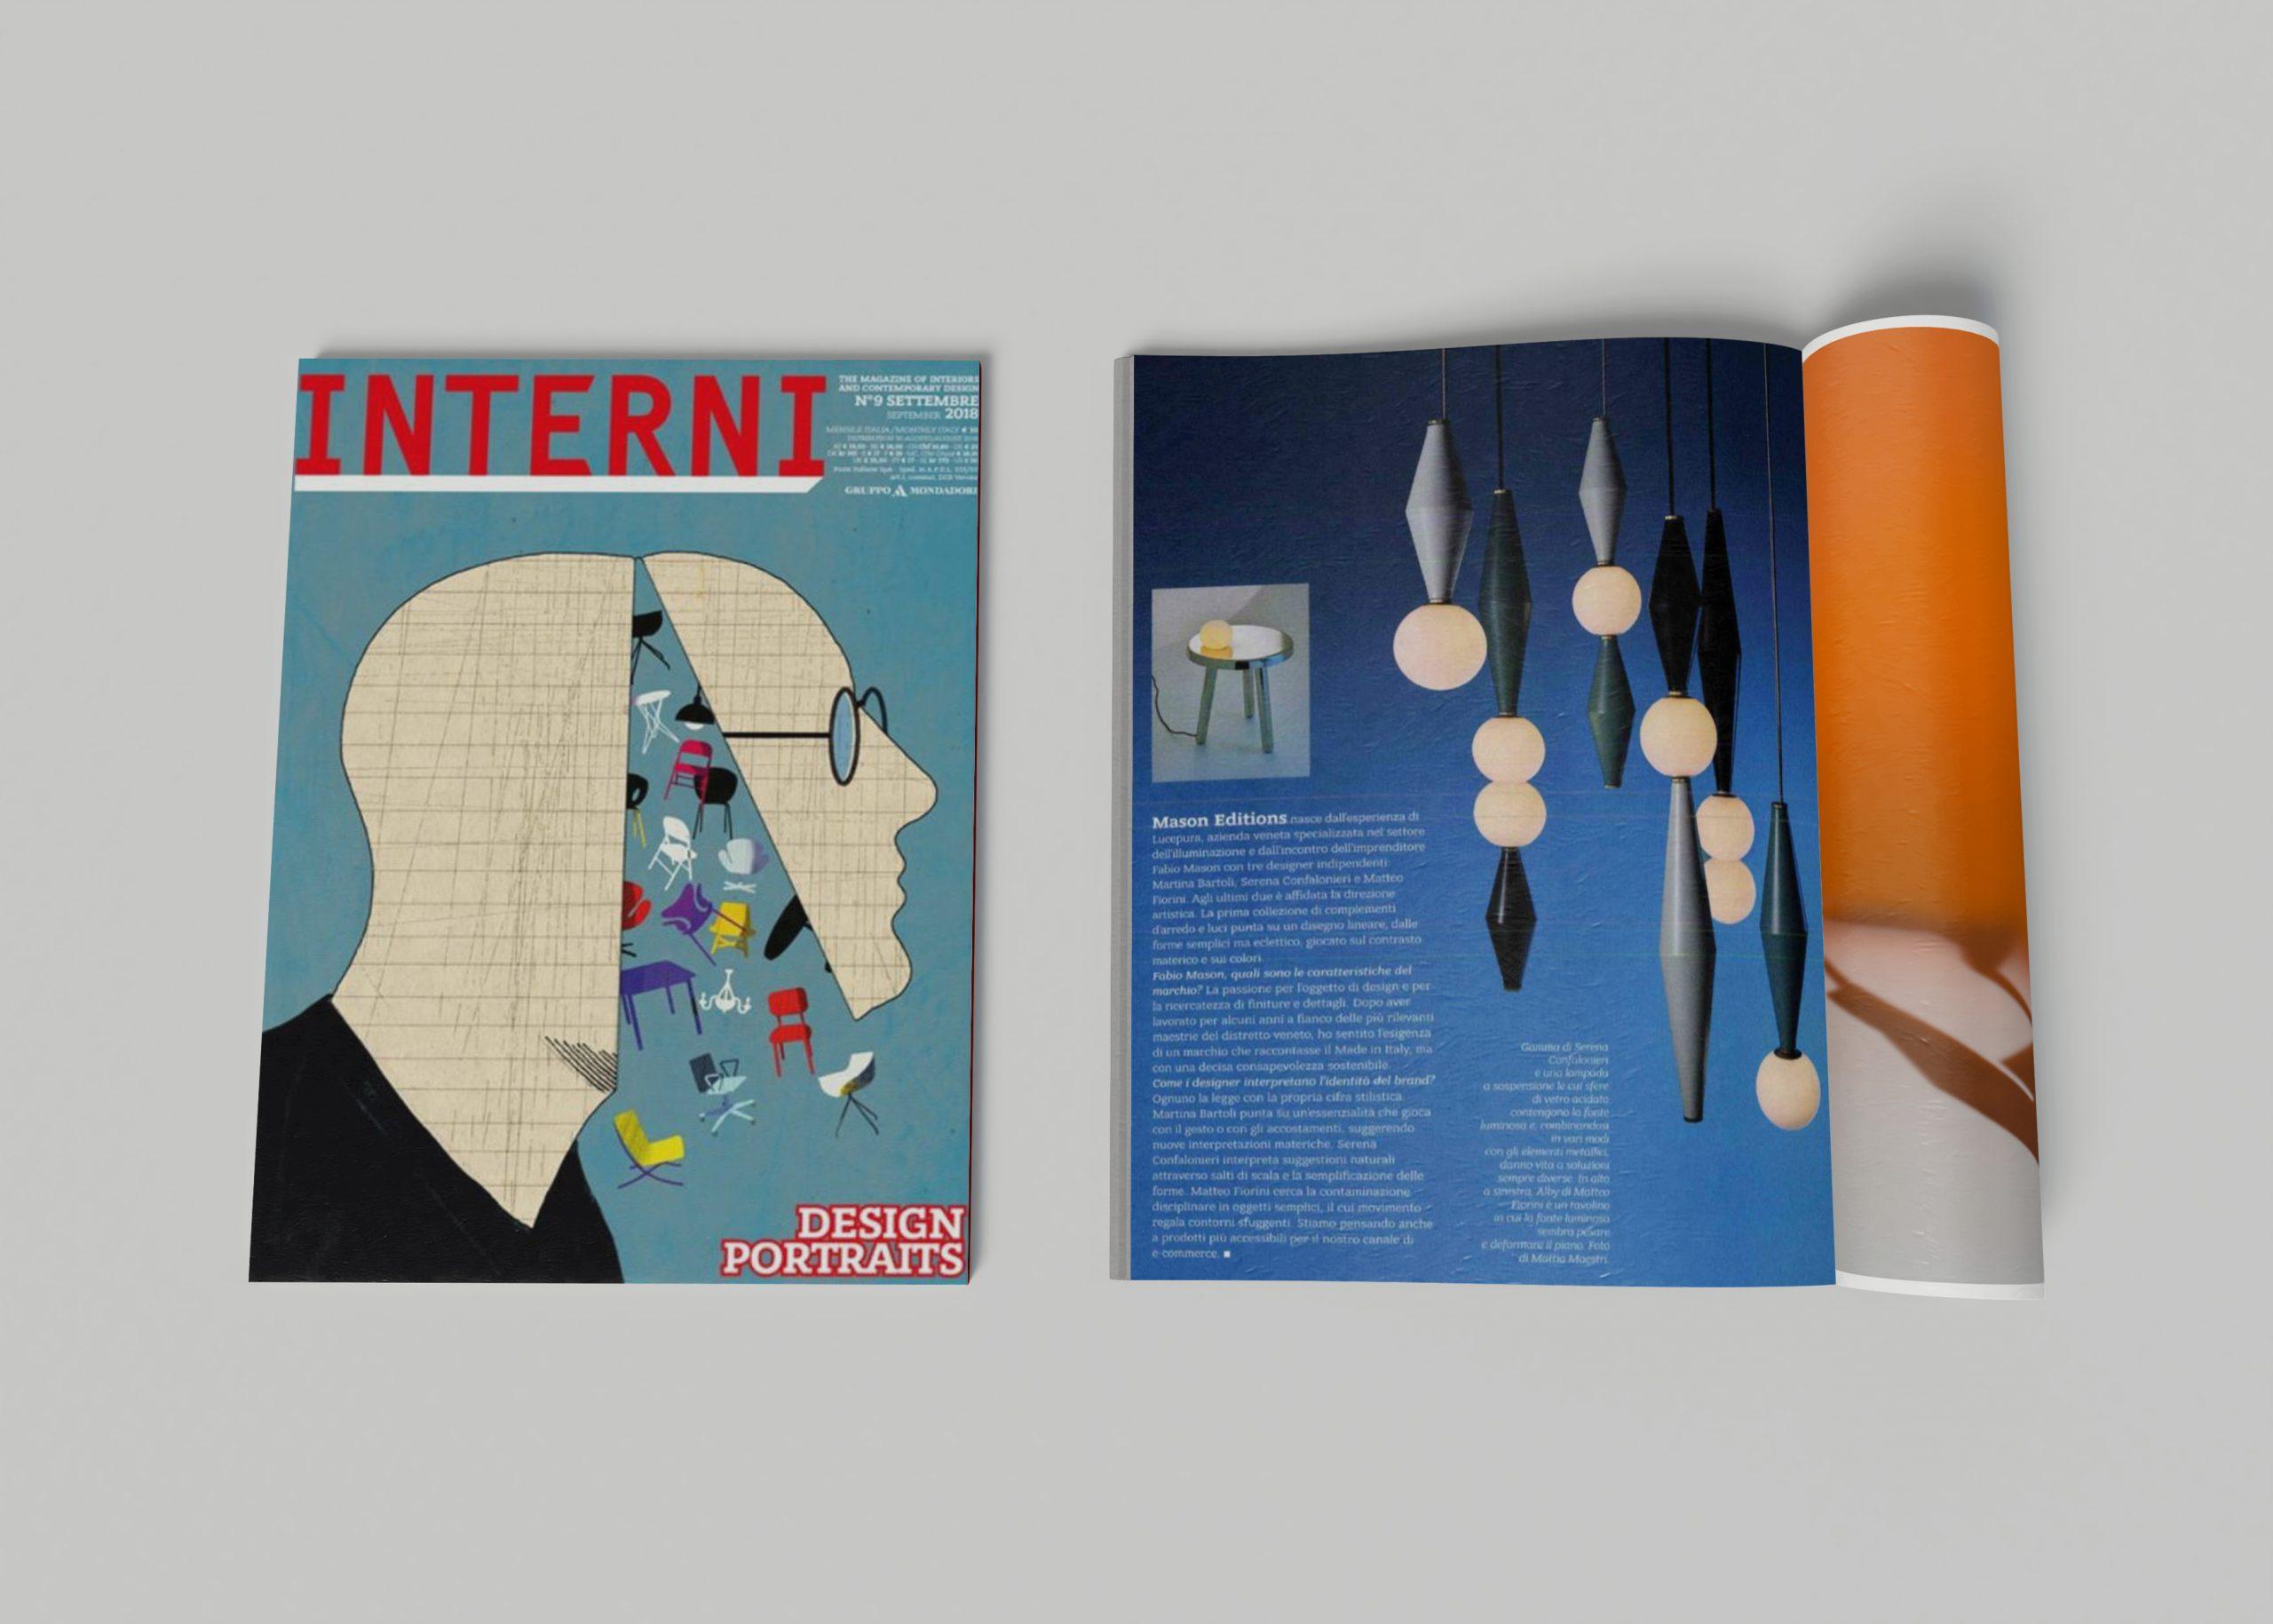 Interni inside our press page